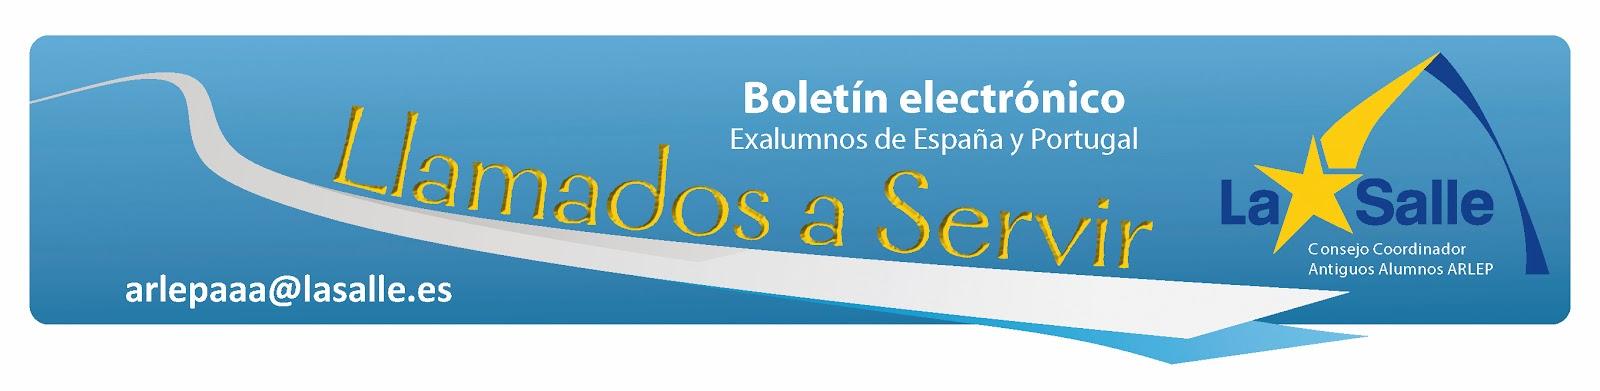 http://www.lasalle.es/aaa/docs_web/e-boletin/Boletin_21.pdf